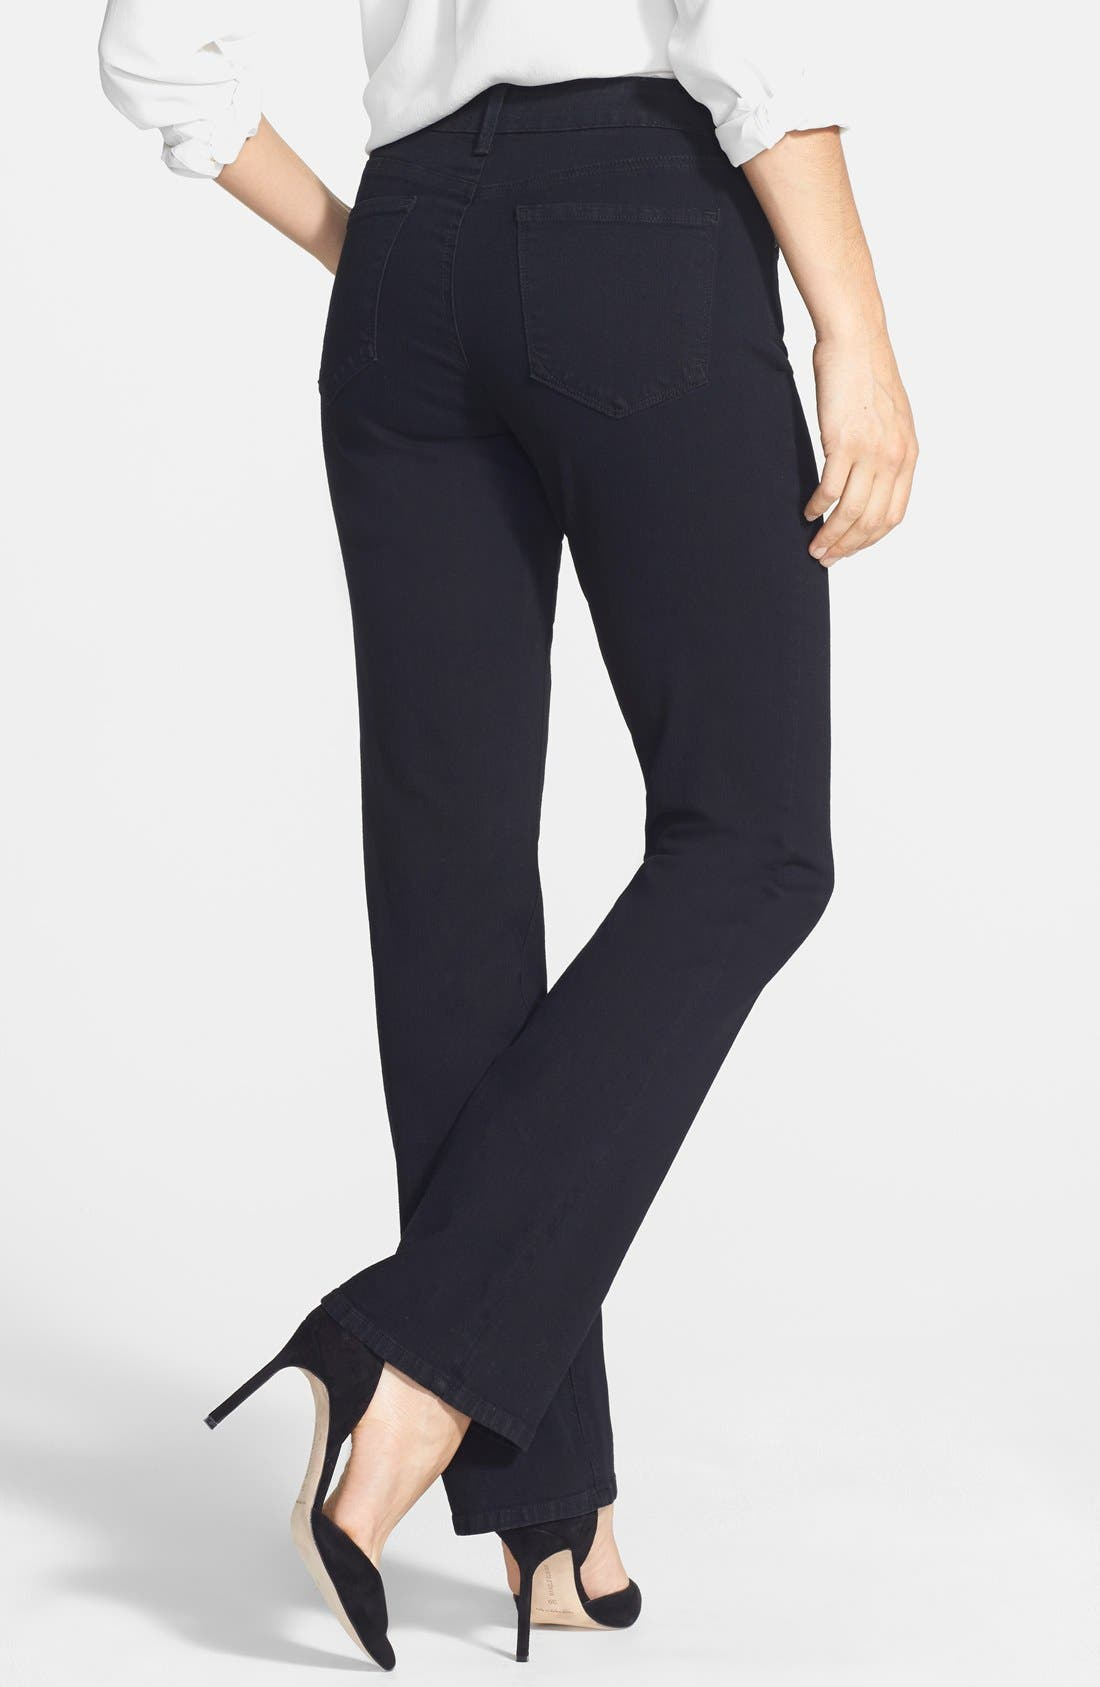 NYDJ, 'Billie' Stretch Mini Bootcut Jeans, Alternate thumbnail 2, color, BLACK